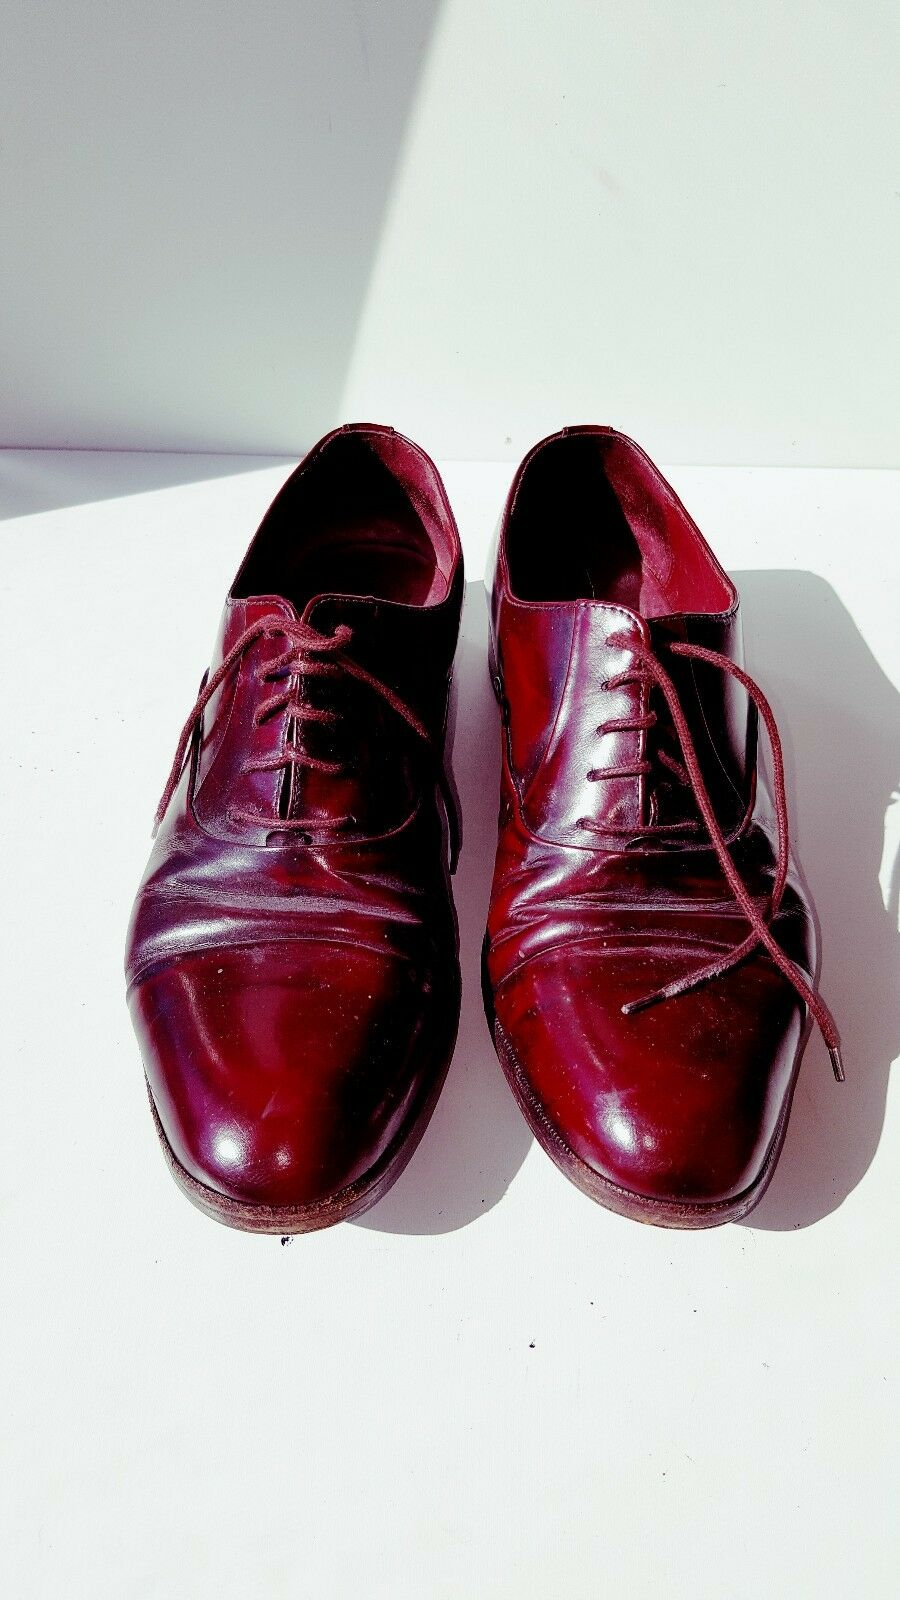 MARIO BRUNI BURGANDY Pelle Oxfords Dress Shoes Burgundy, Italy